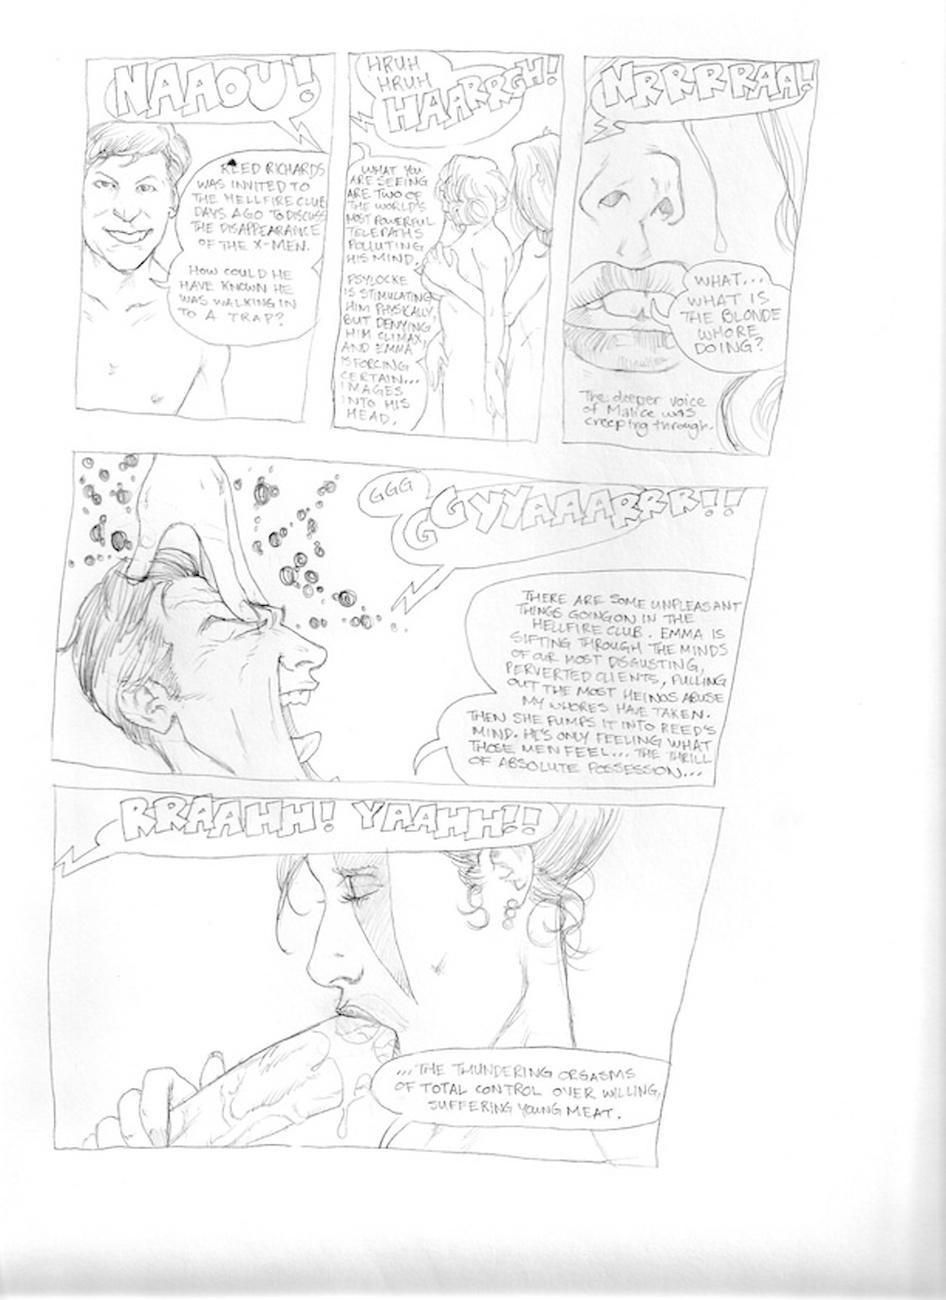 Submission Agenda 5 - The Invisible Woman 24 free sex comic